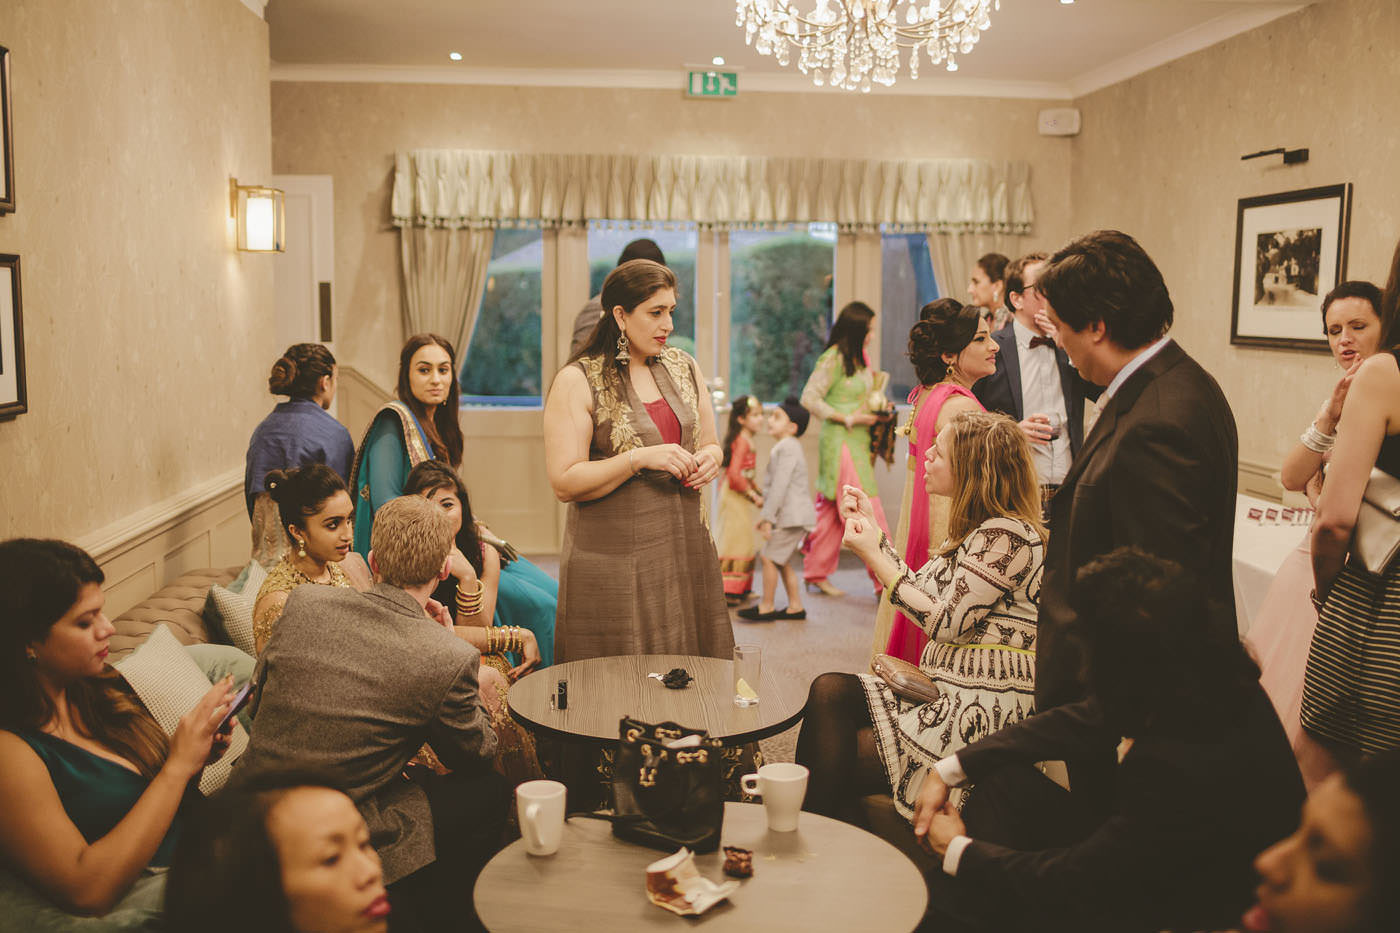 edmundjasveen burford bridge hotel wedding photographer 0076